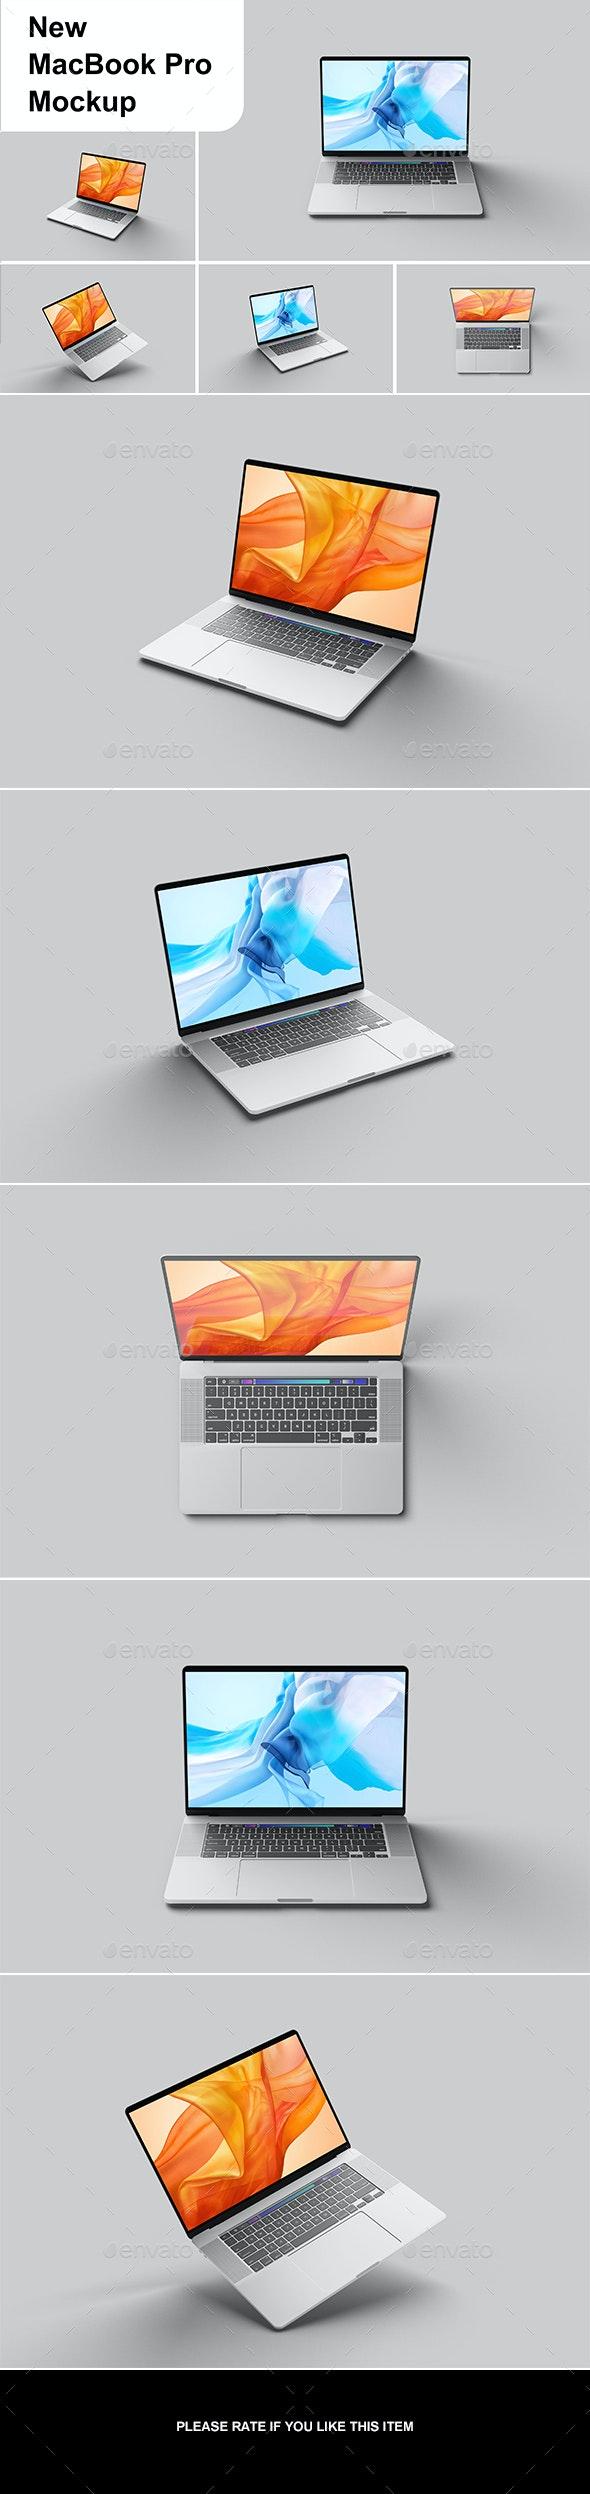 New MacBook Pro Mockup - Displays Product Mock-Ups